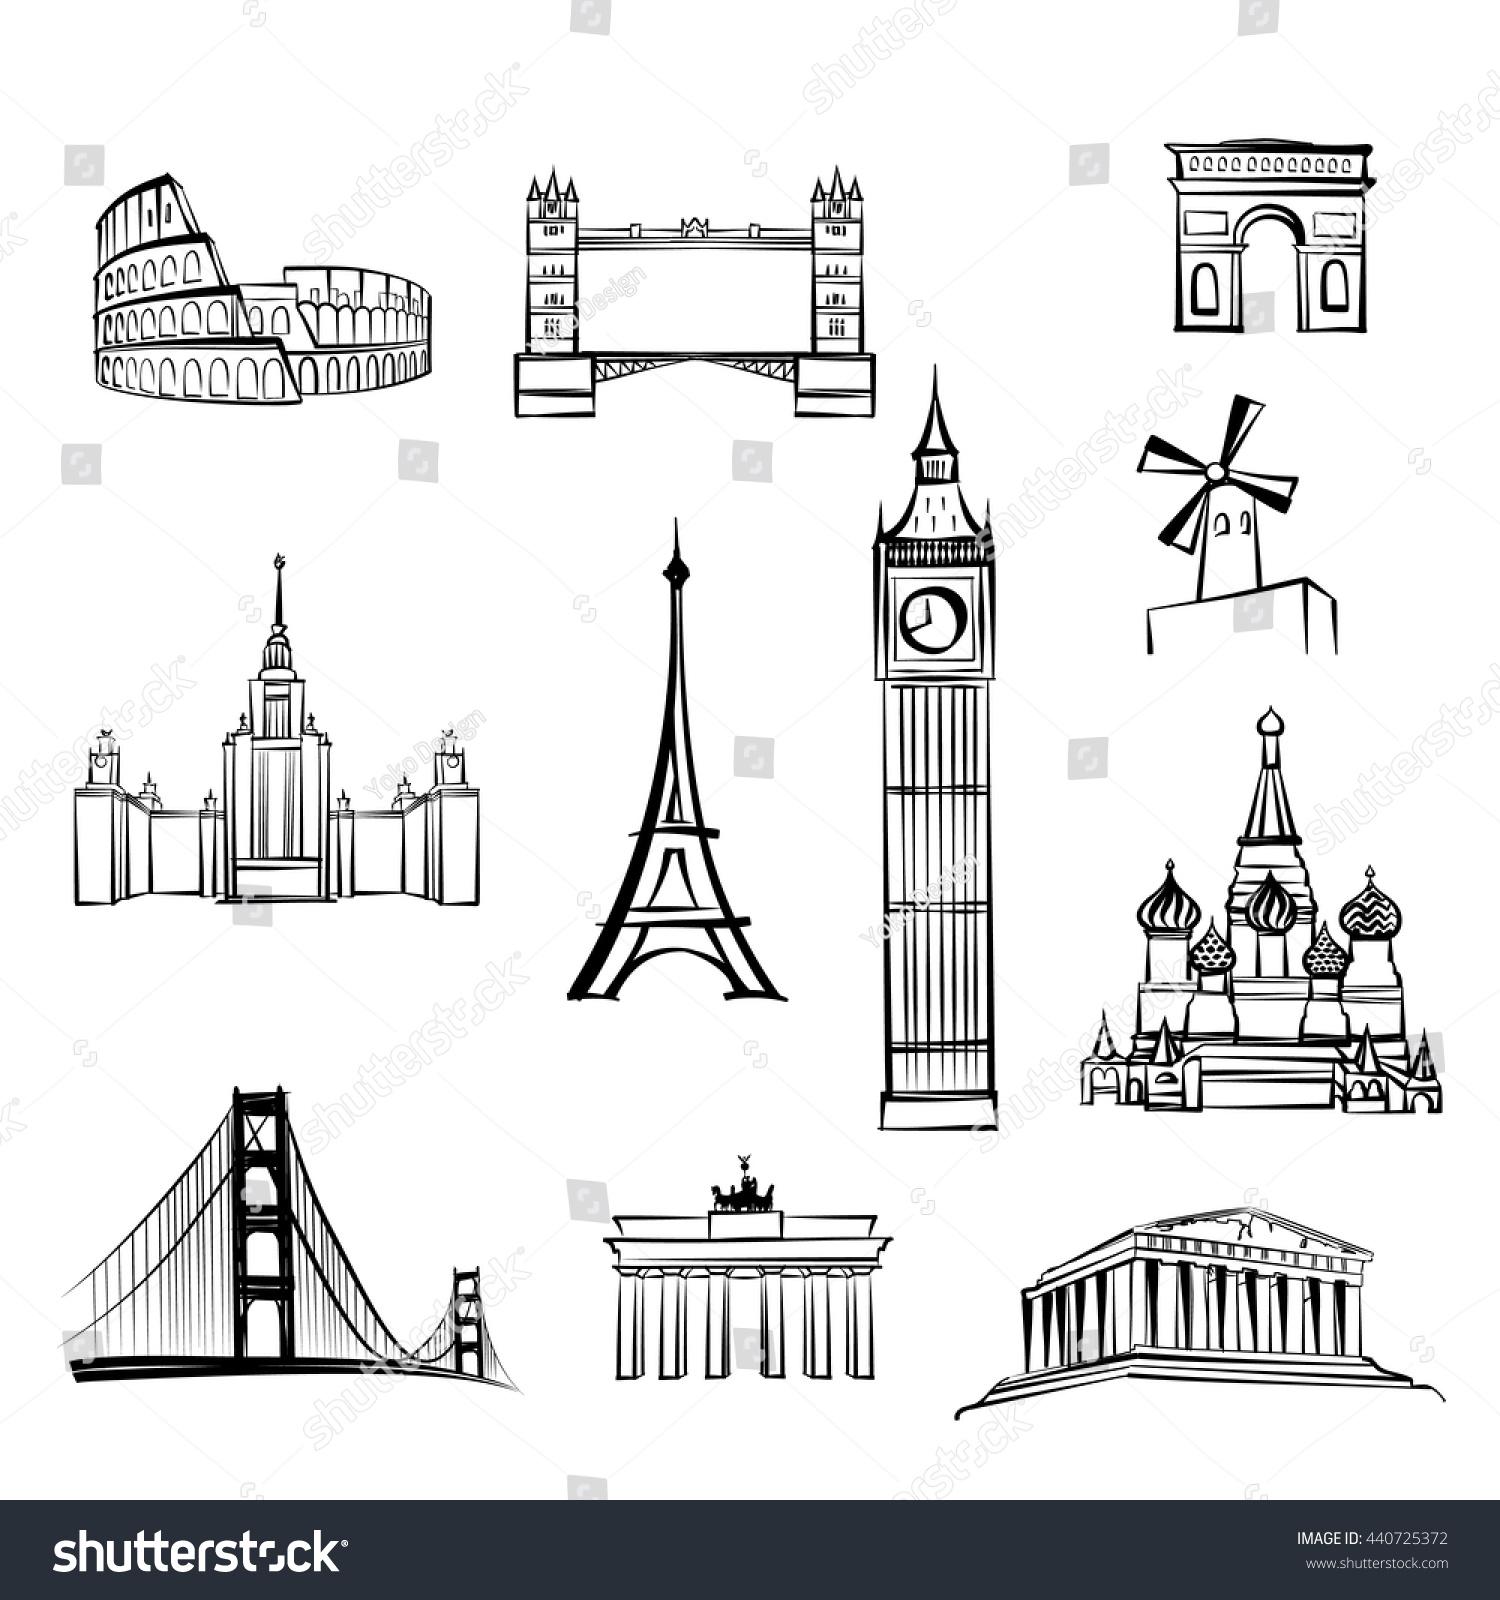 World tourist attractions symbols world famous stock - San francisco tourist information office ...